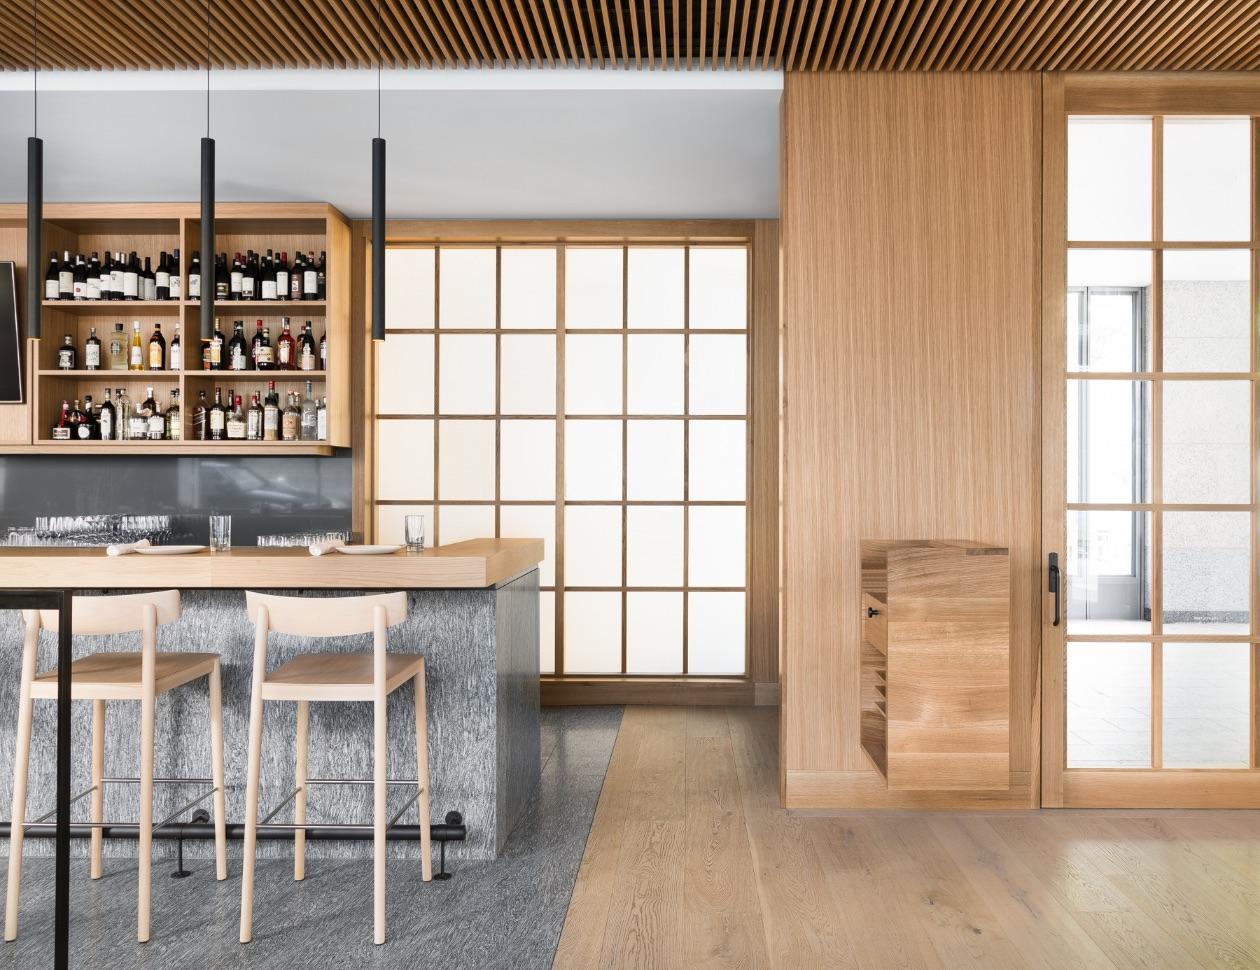 4_Heliotrope Architects_Cortina Restaurant_Inspirationist